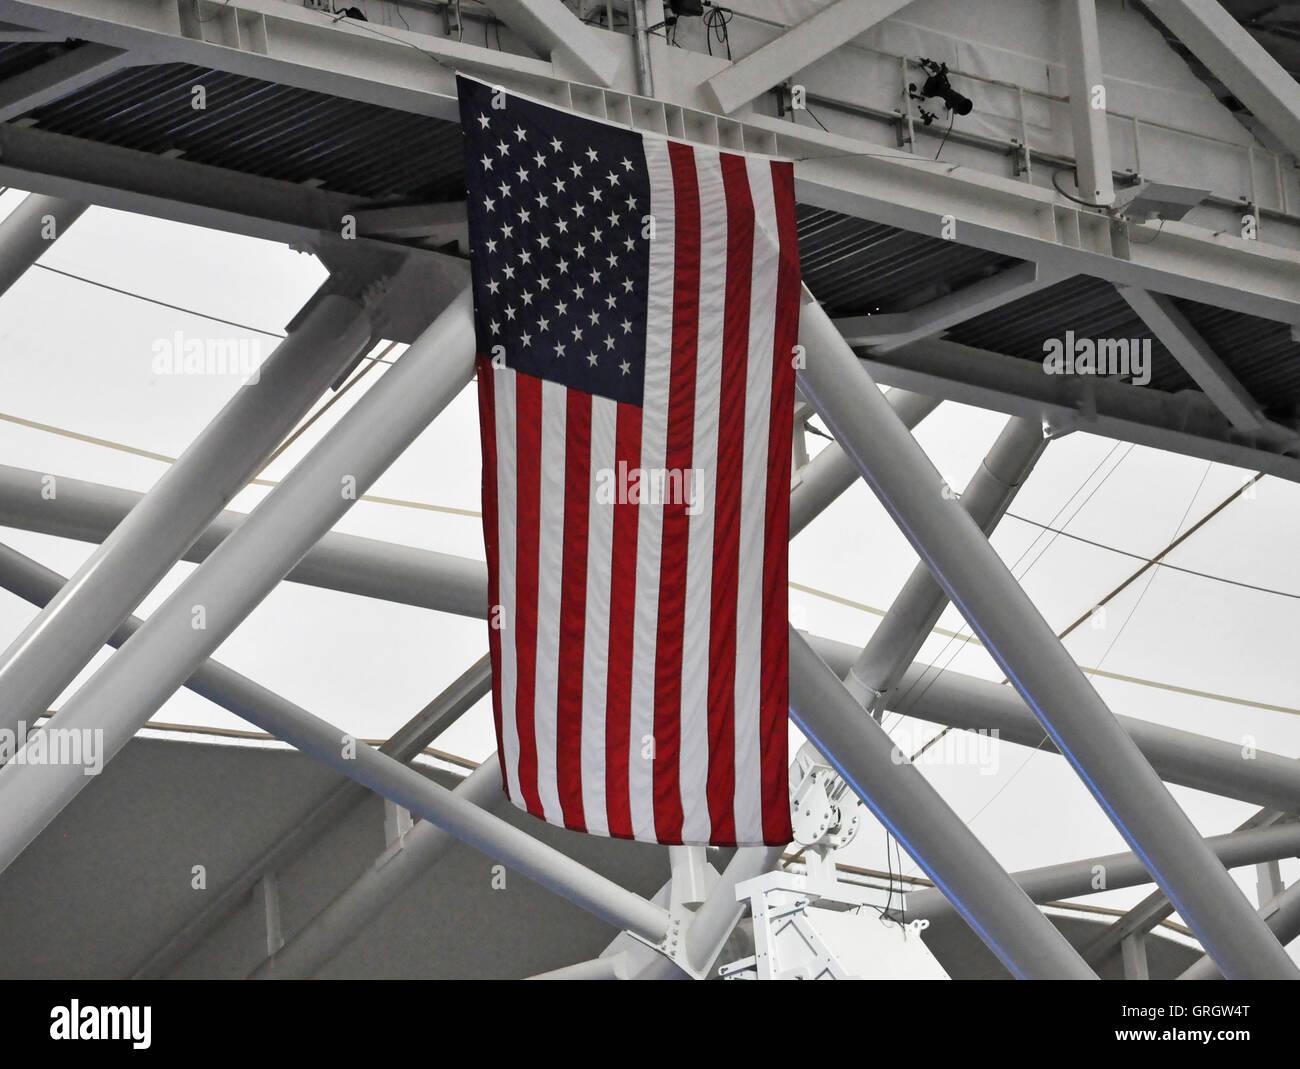 Flushing Meadows, New York. September 6, 2016. The US open flag hangs above Arthur Ashe stadium. Credit:  Veronica - Stock Image